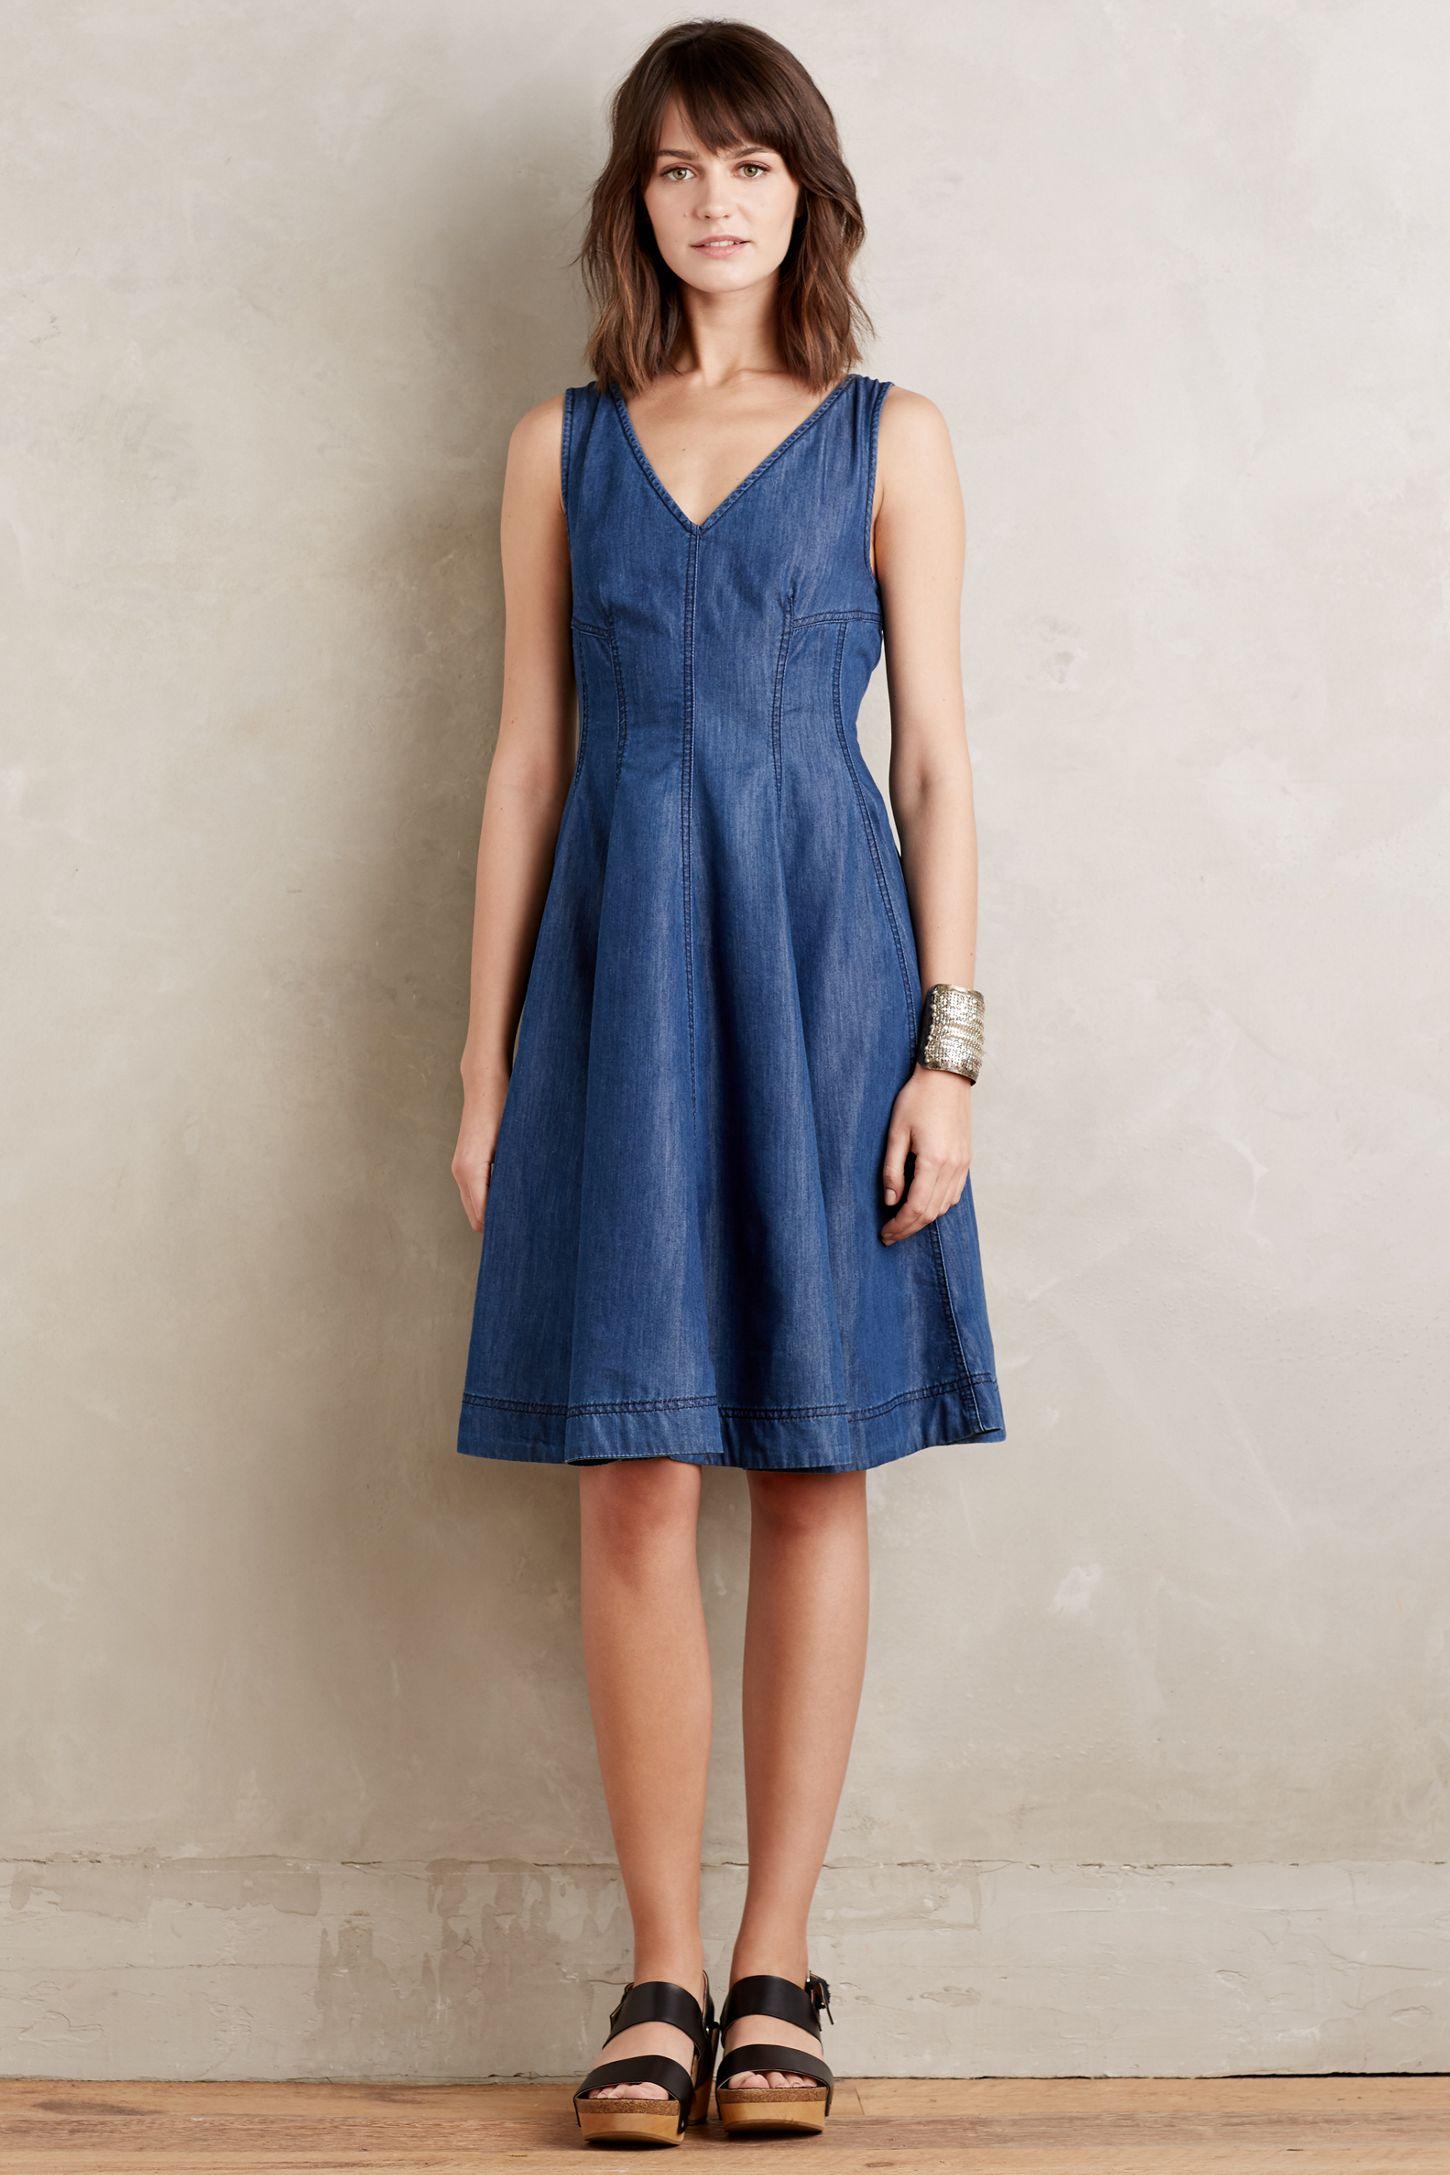 94f2f365905 Buy Sleeveless Denim Dress Uk